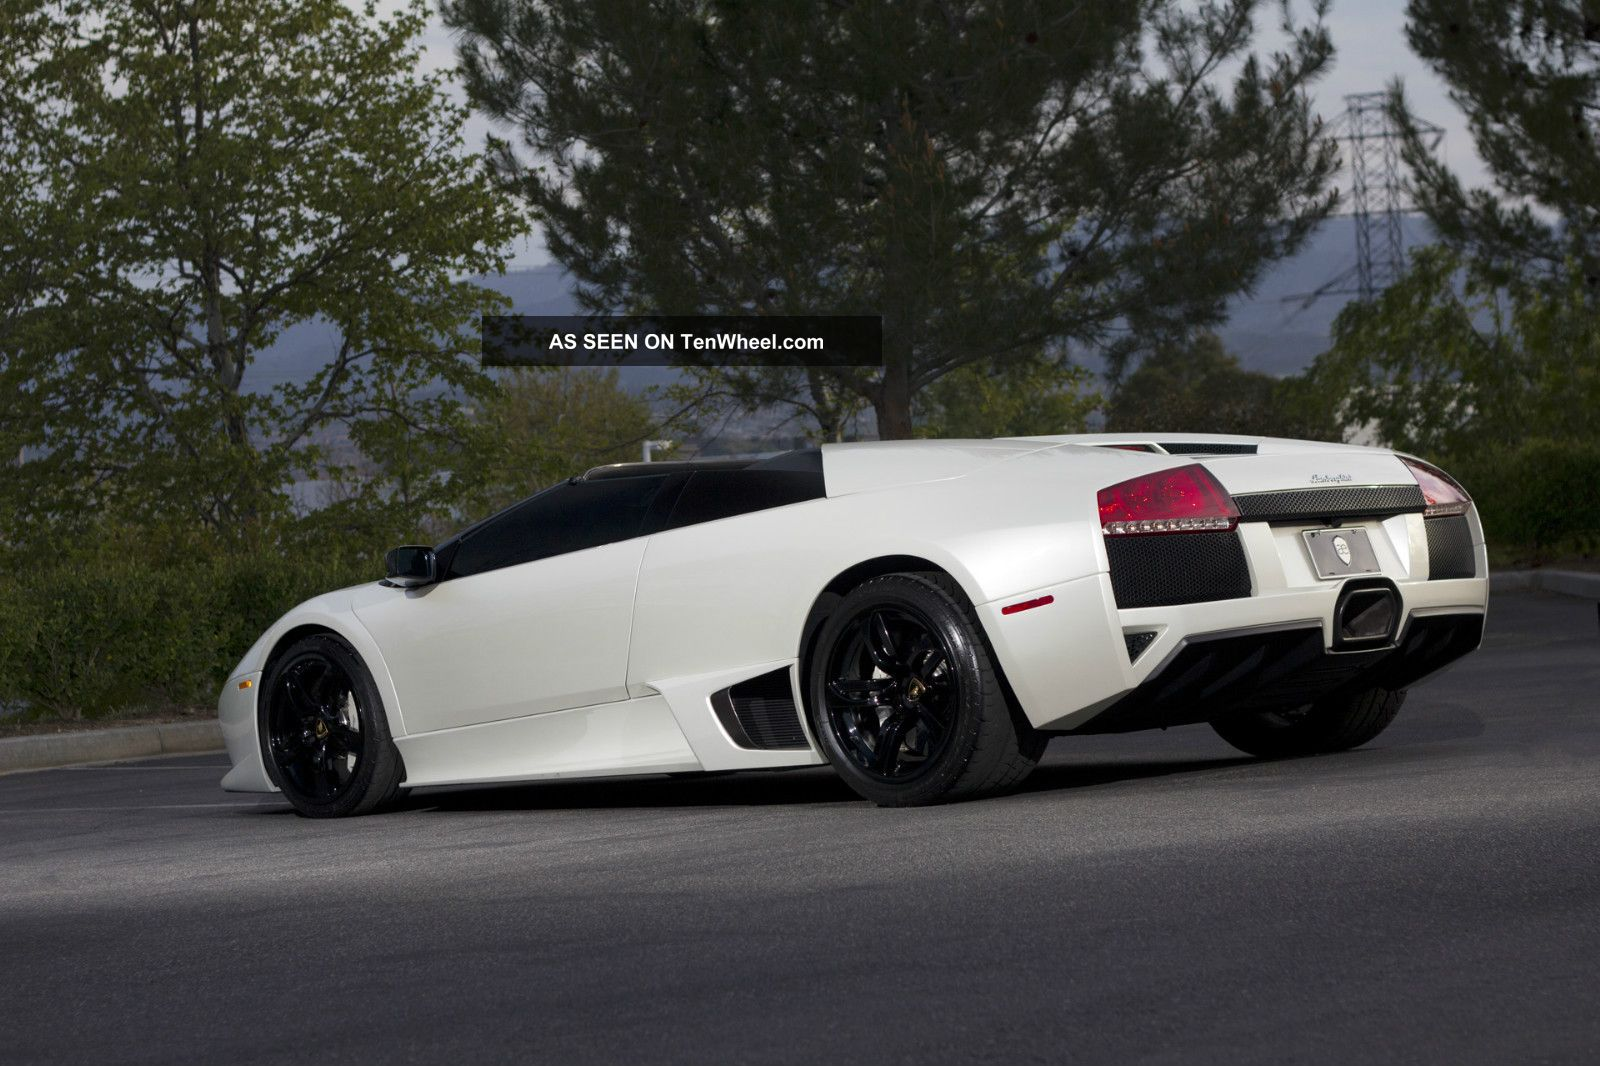 2008 Lamborghini Murcielago Lp640 Convertible 2 Door 6 5l